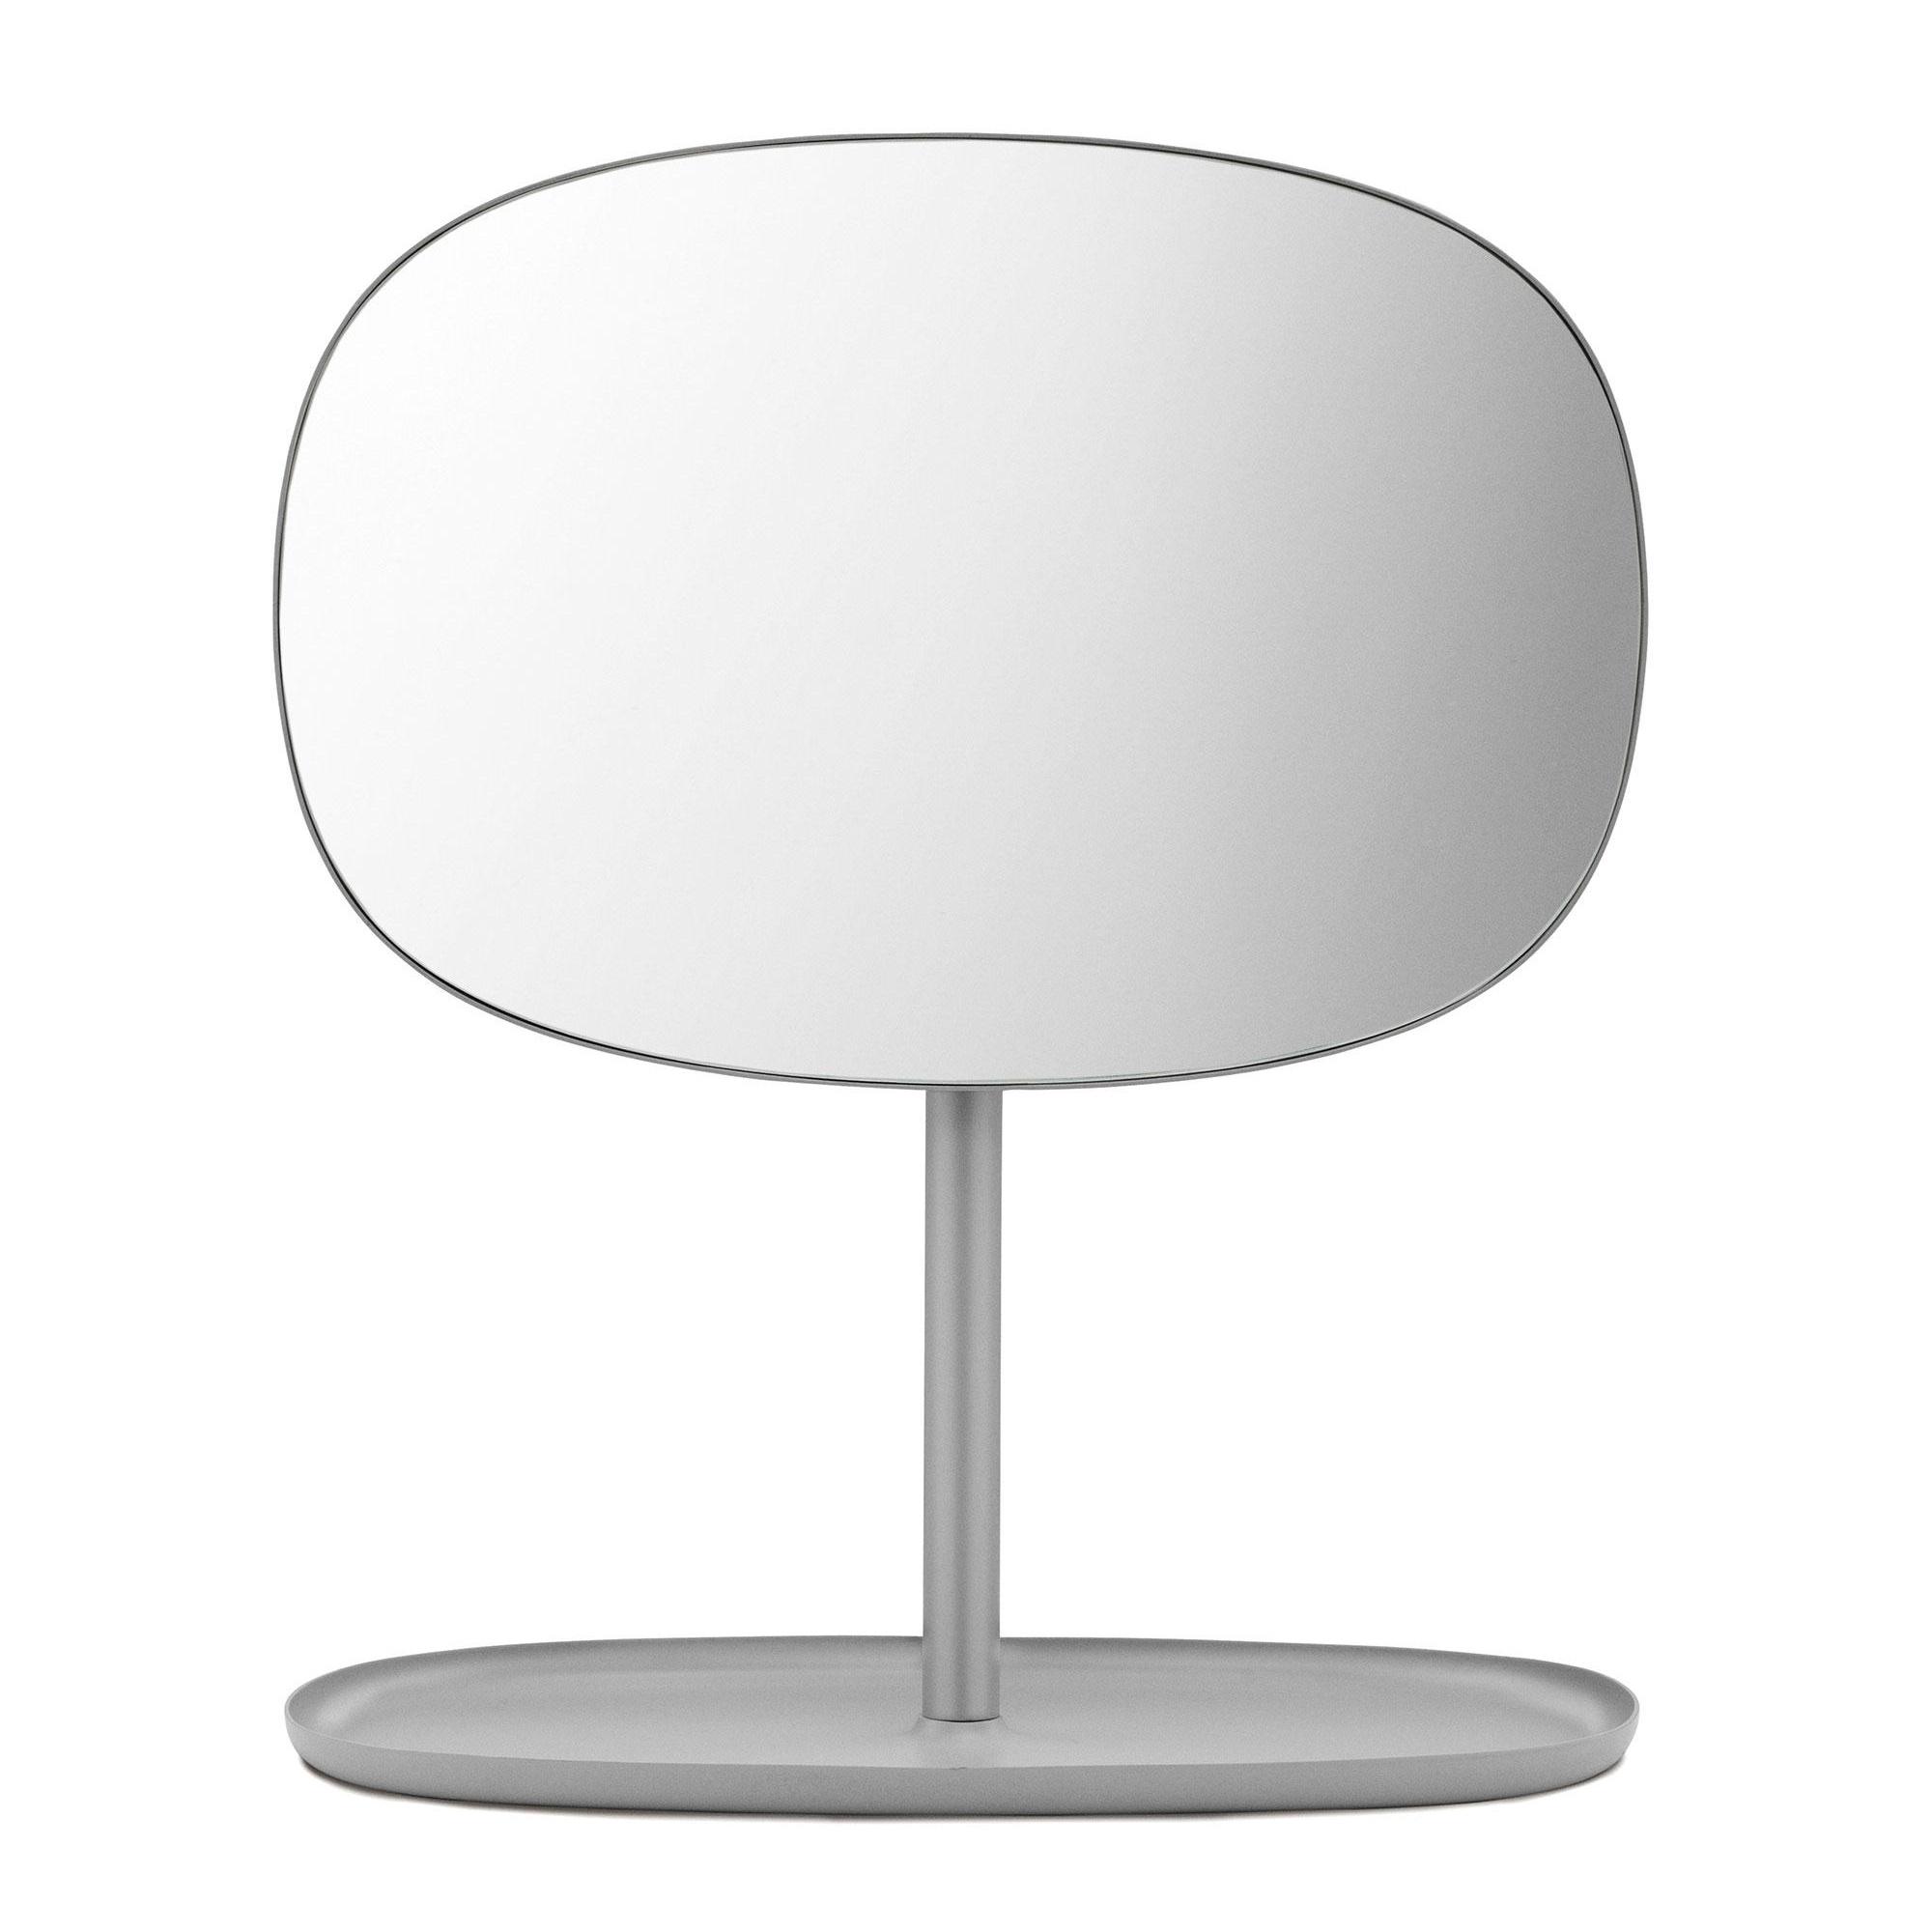 Normann Copenhagen - Flip Kosmetikspiegel - grau/BxHxT 28x34|5x19|5cm | Bad > Bad-Accessoires > Kosmetikspiegel | Grau | Stahl| spiegelglas | Normann Copenhagen